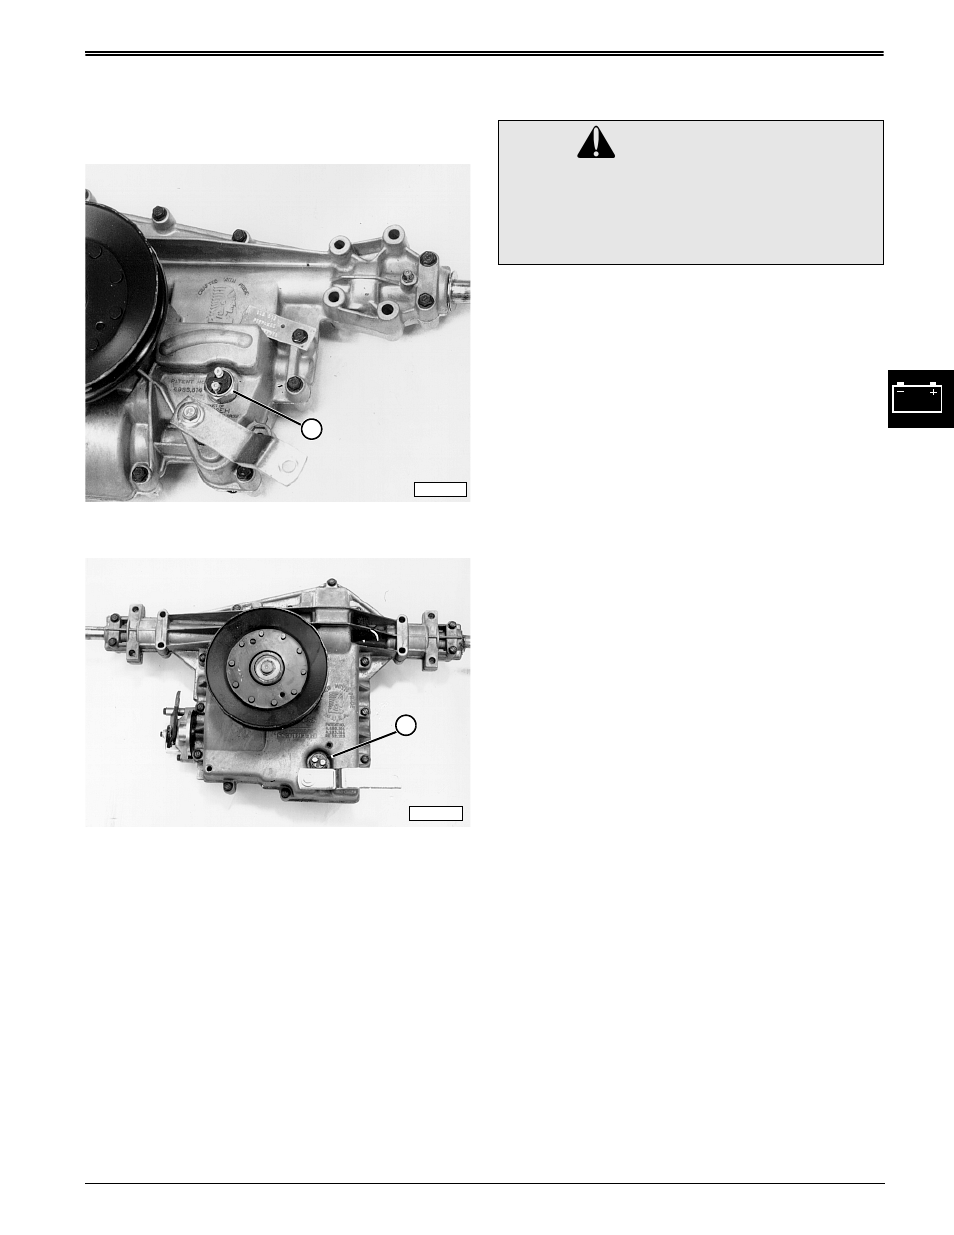 Caution John Deere Stx38 User Manual Page 163 314 Stx 38 Wiring Diagram Engine